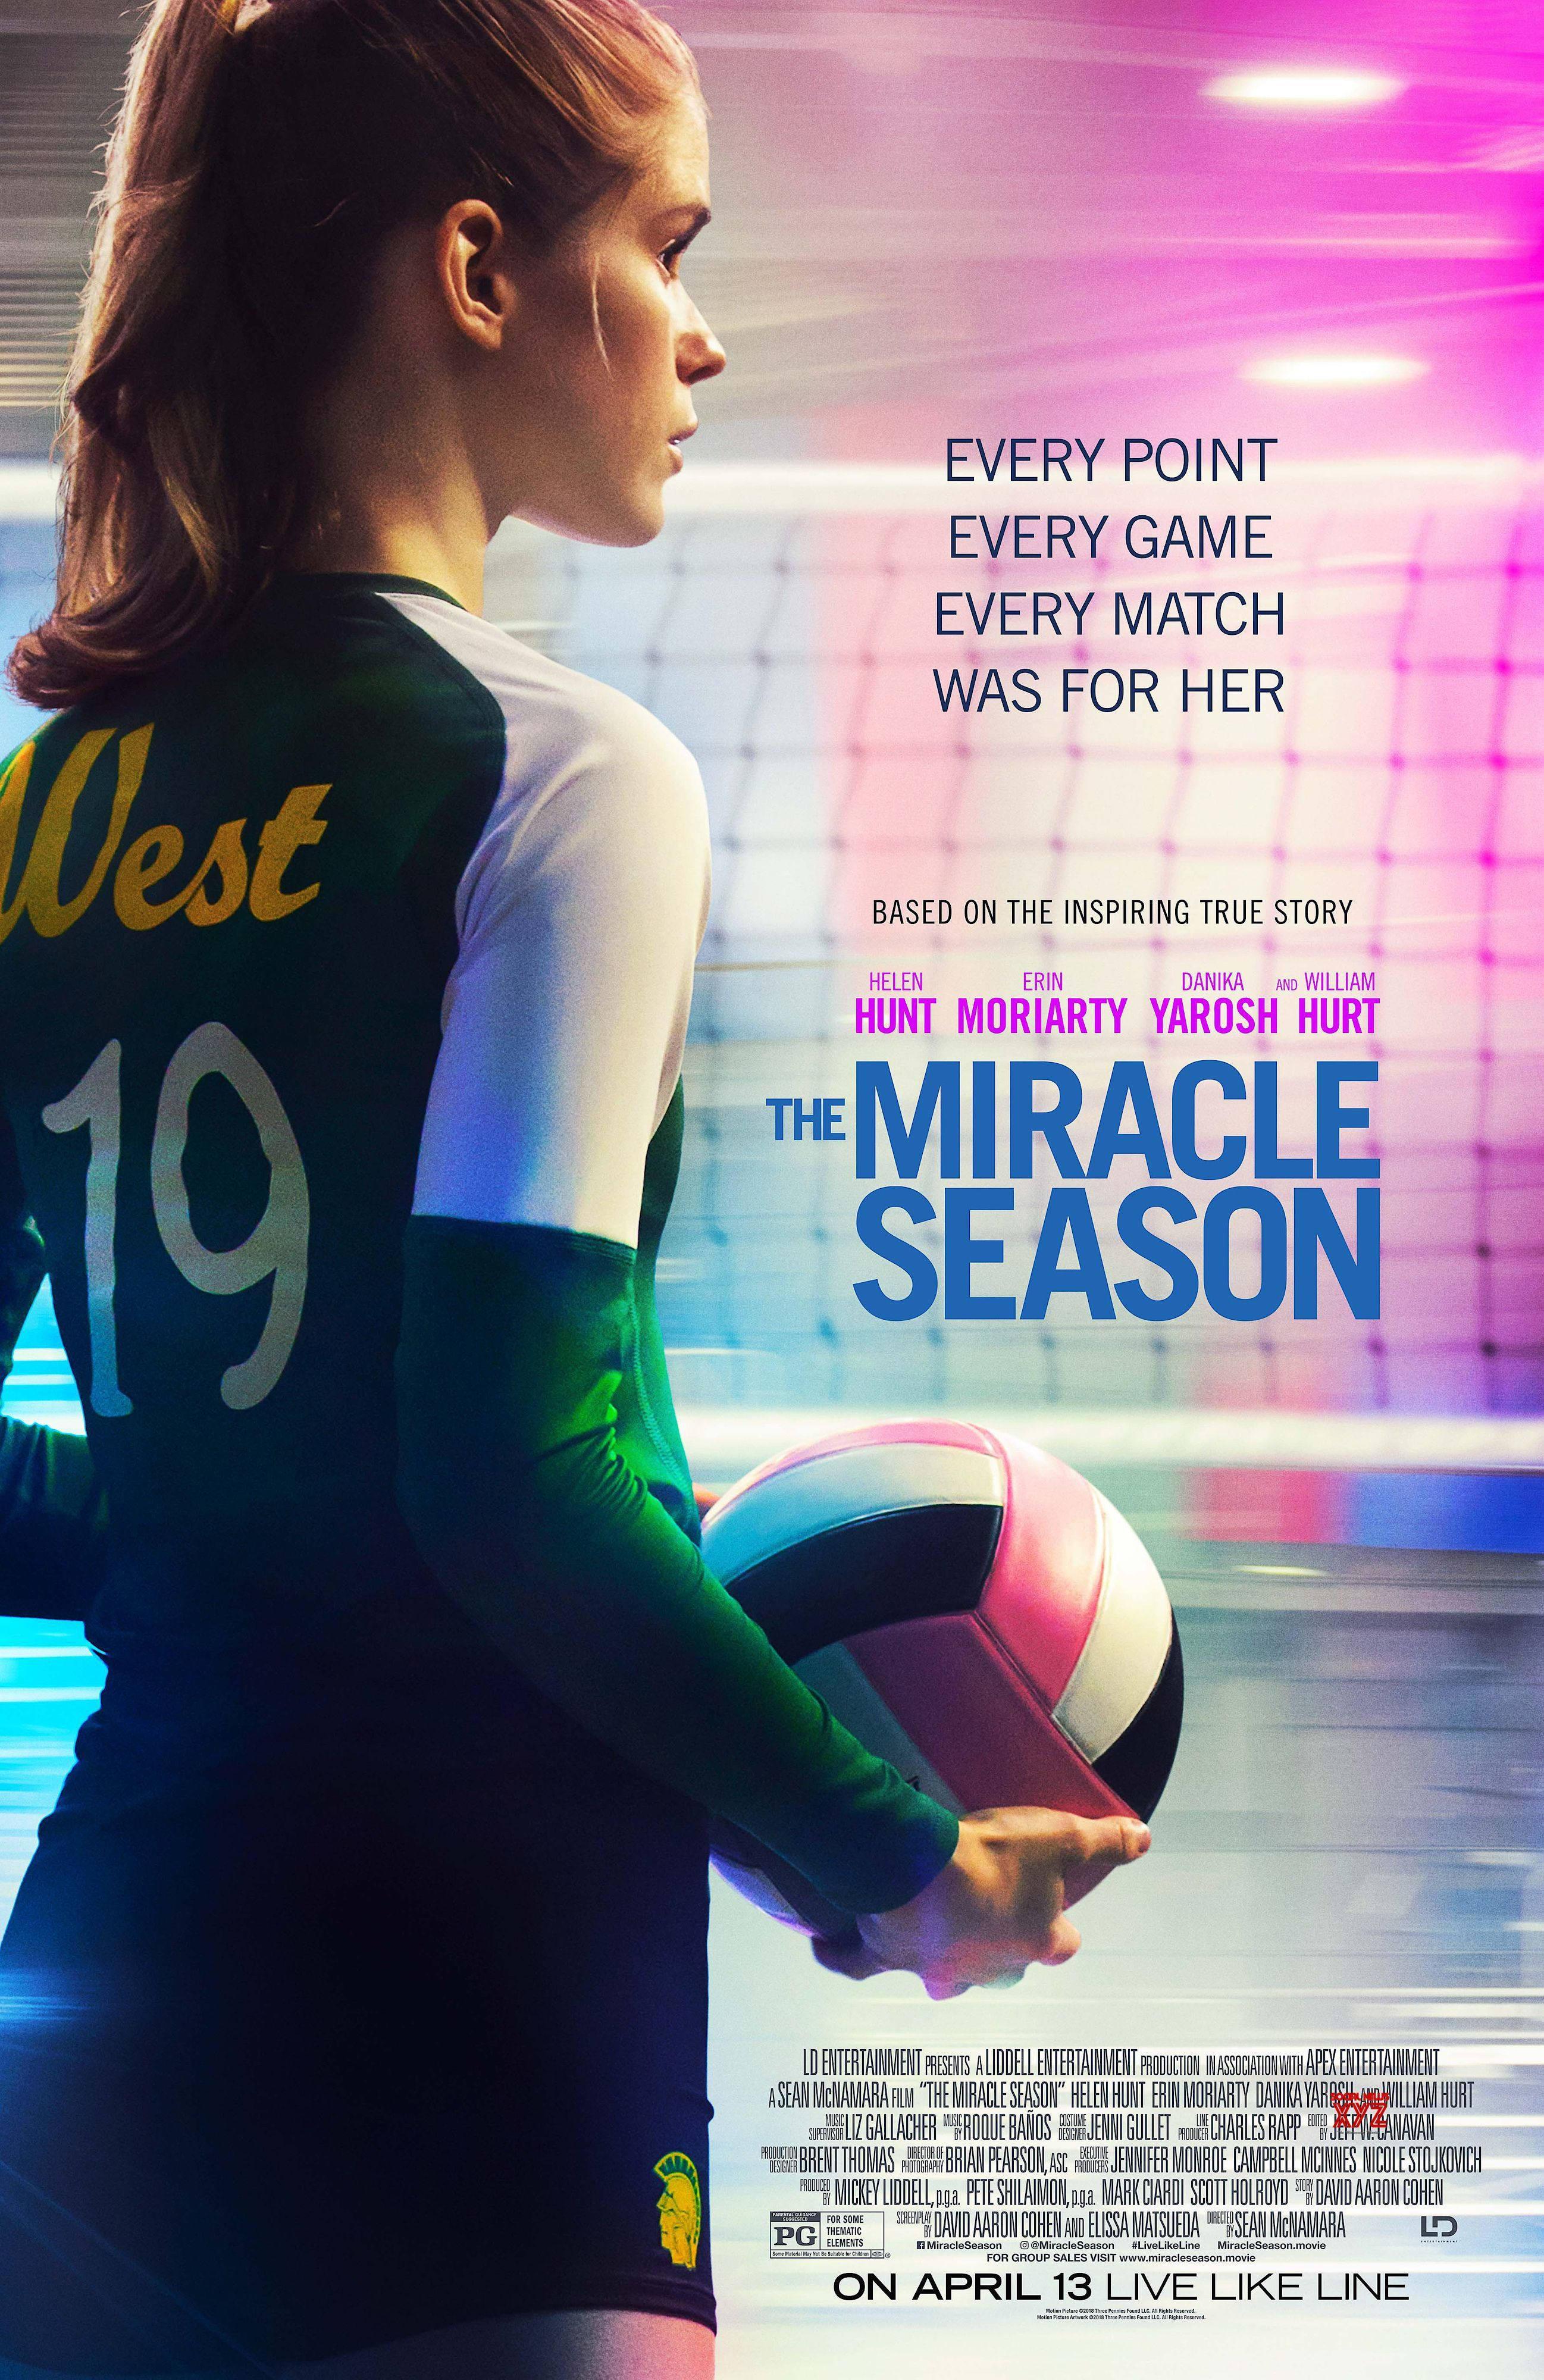 The Miracle Season Movie Poster The Miracle Season Free Movies